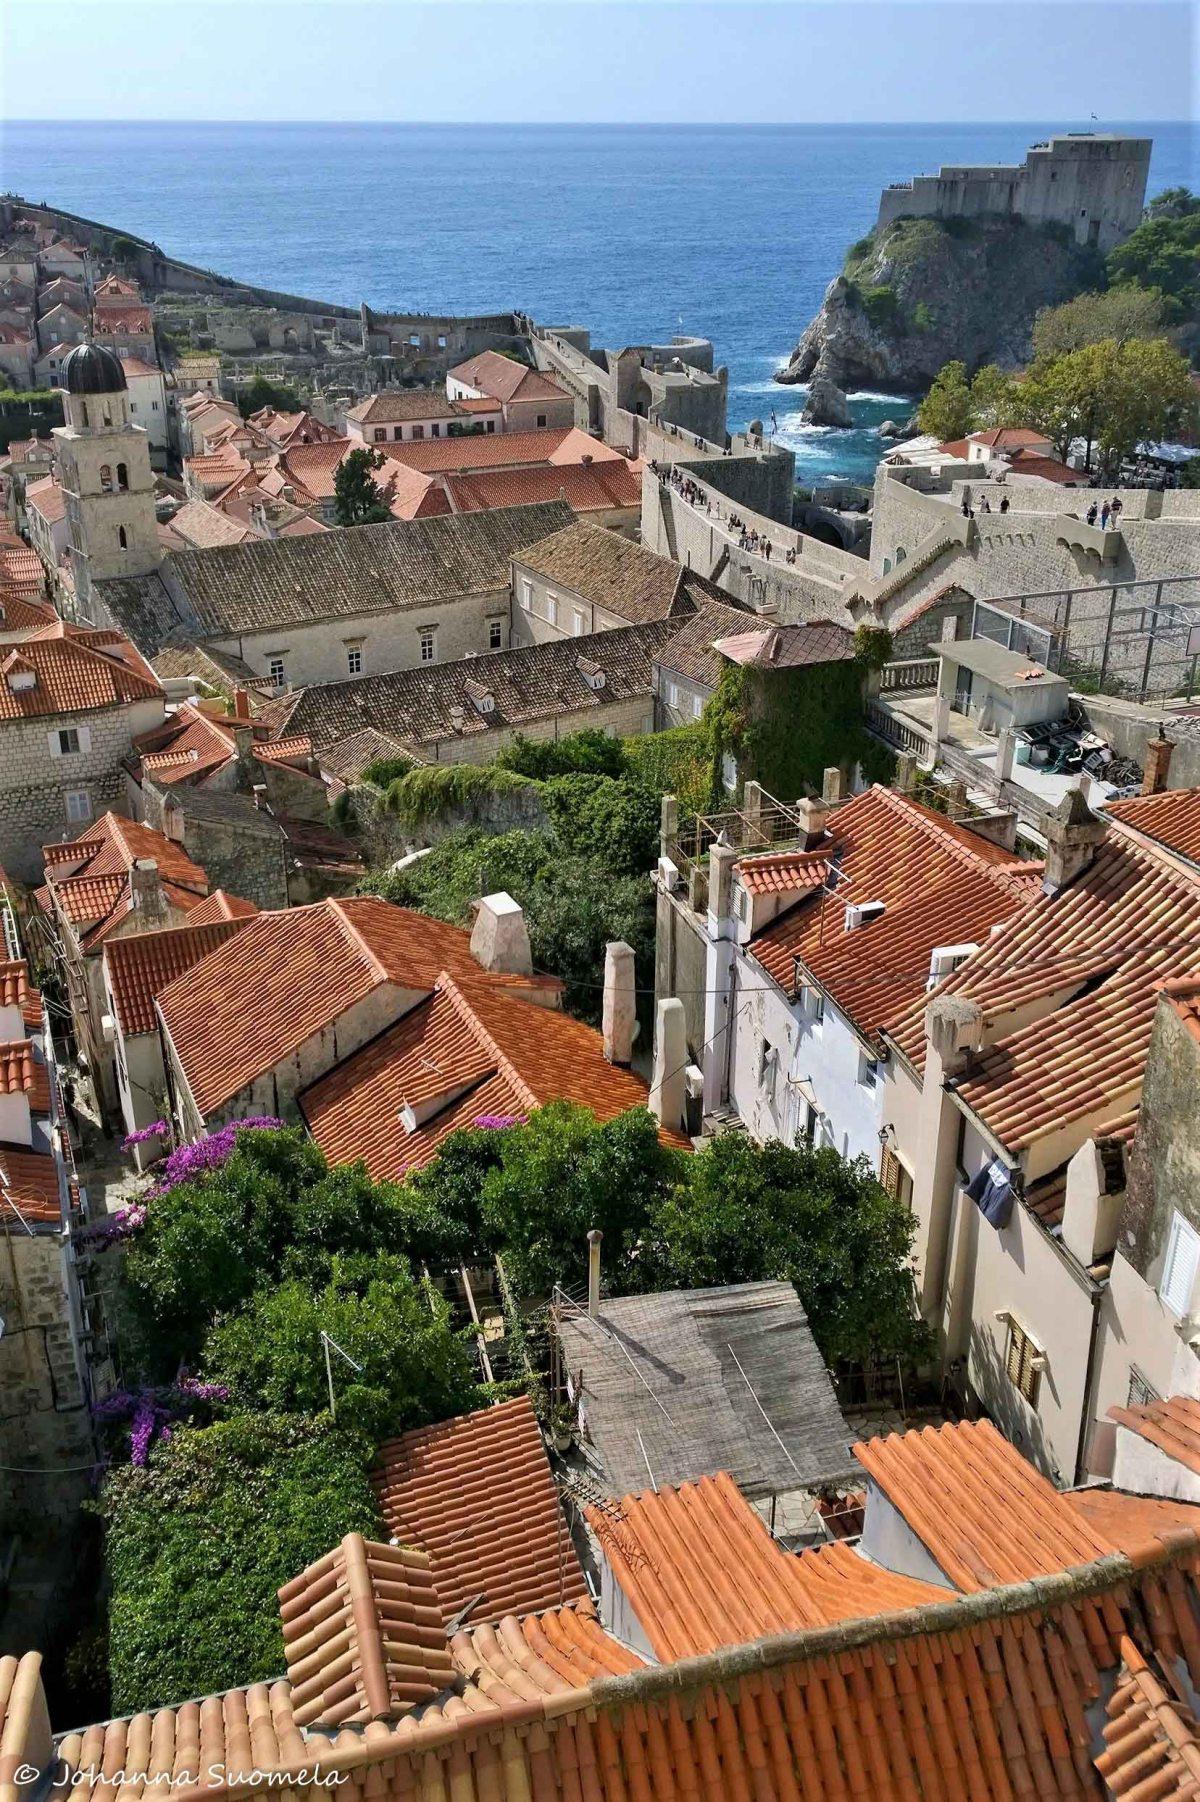 Dubrovnikin kaupungin muurit